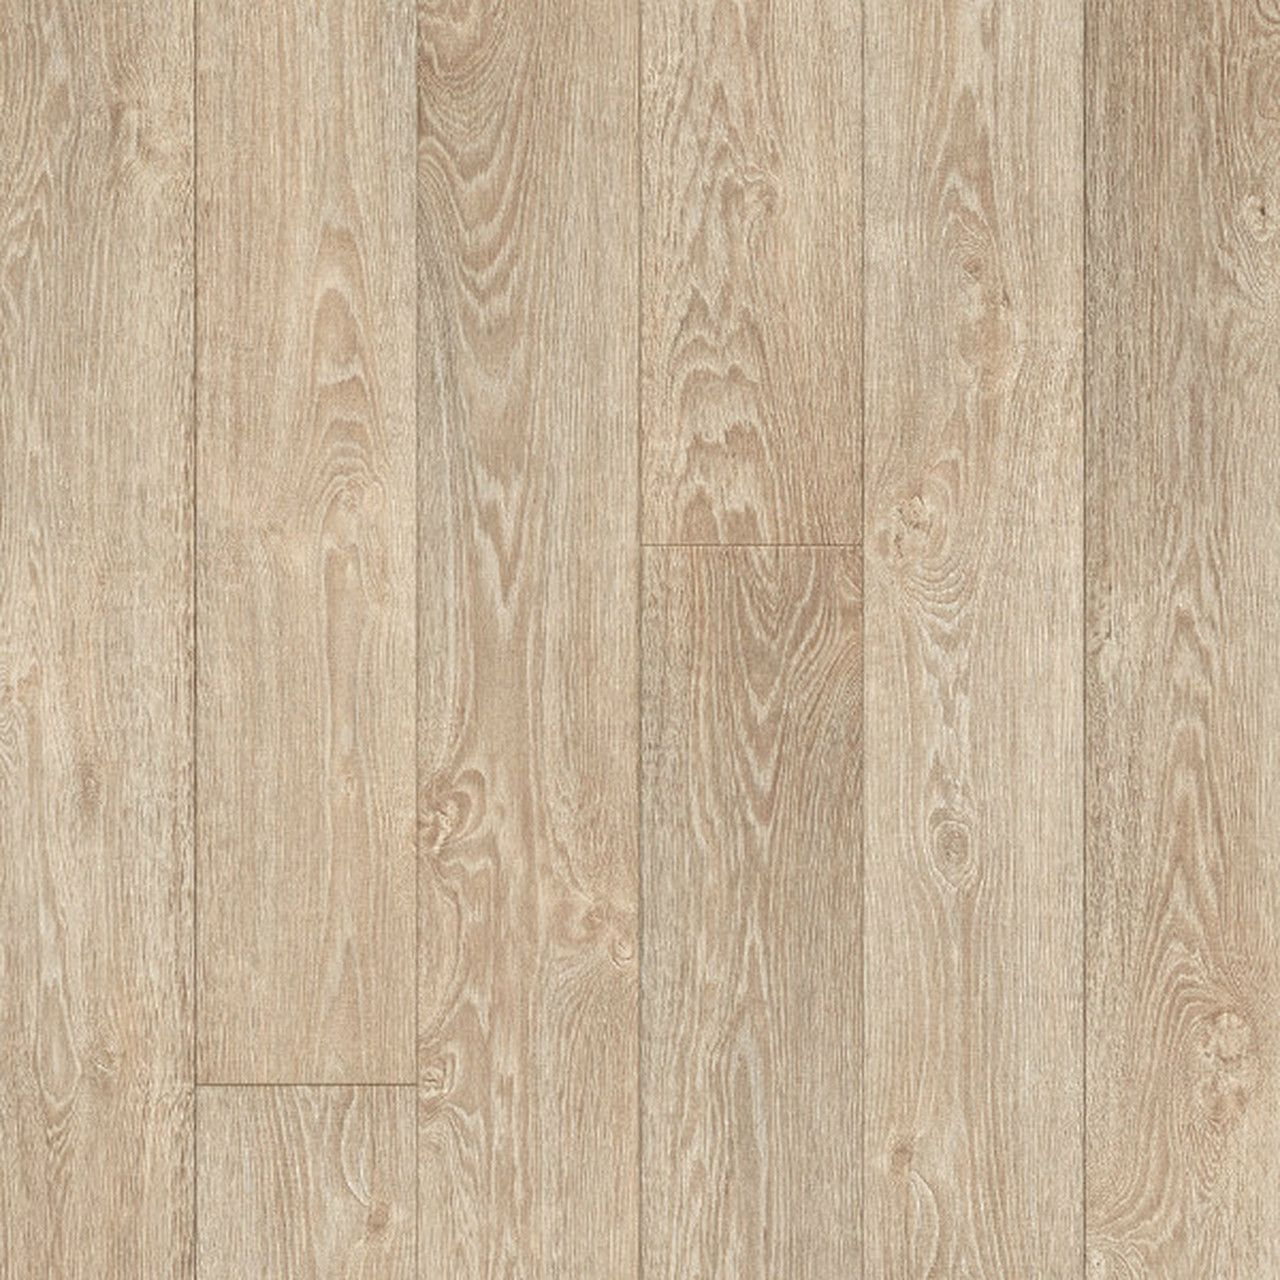 Mannington Restoration Black Forest Oak Antiqued Laminate In 2020 Flooring Mannington Flooring Wood Laminate